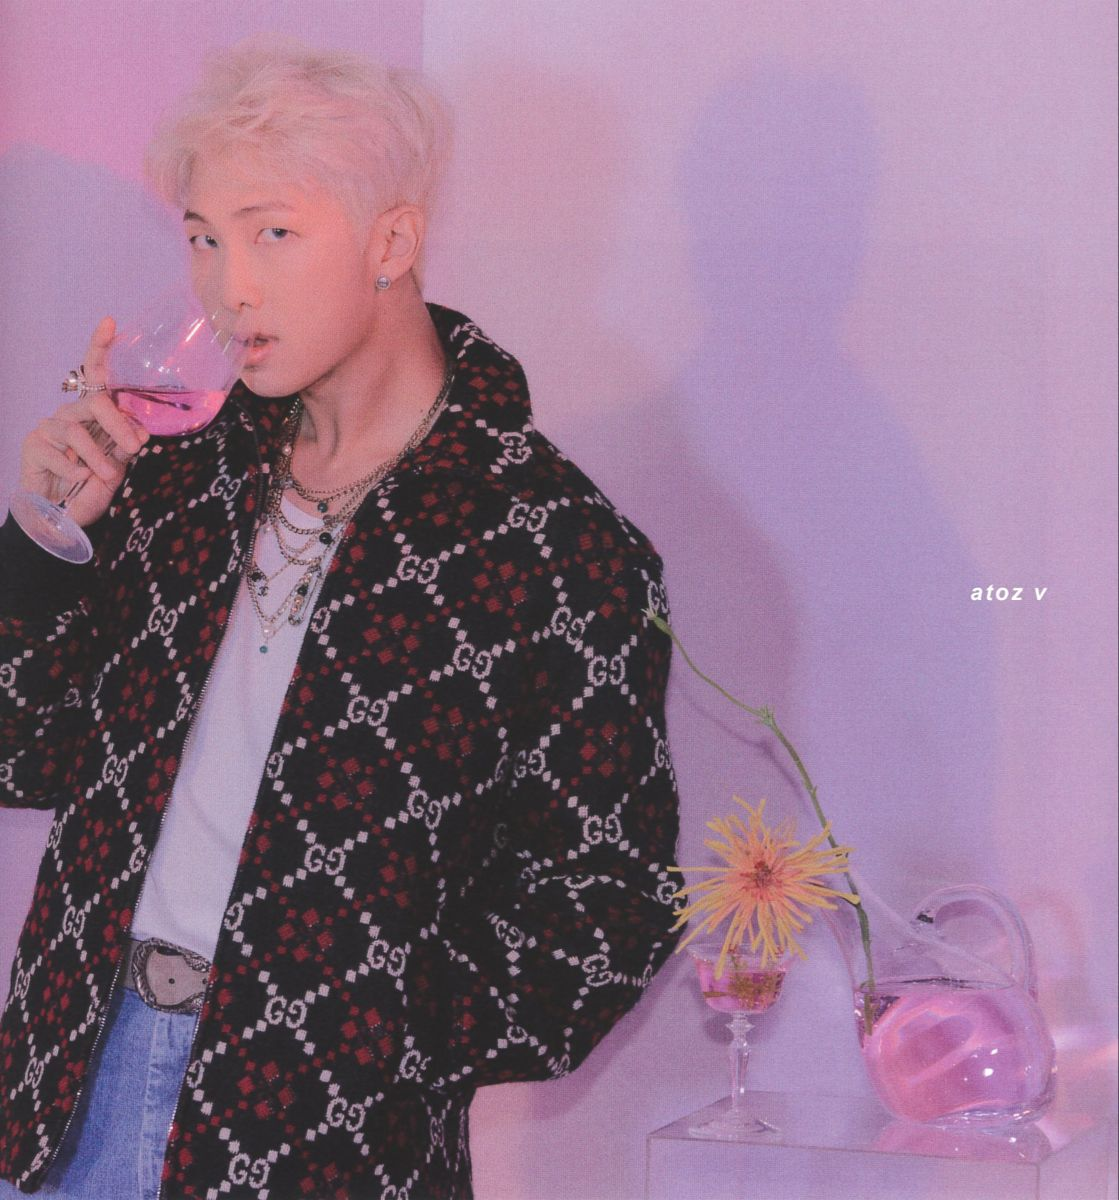 Pin by Ev on BTS in 2020 | Namjoon, Kim namjoon, Persona